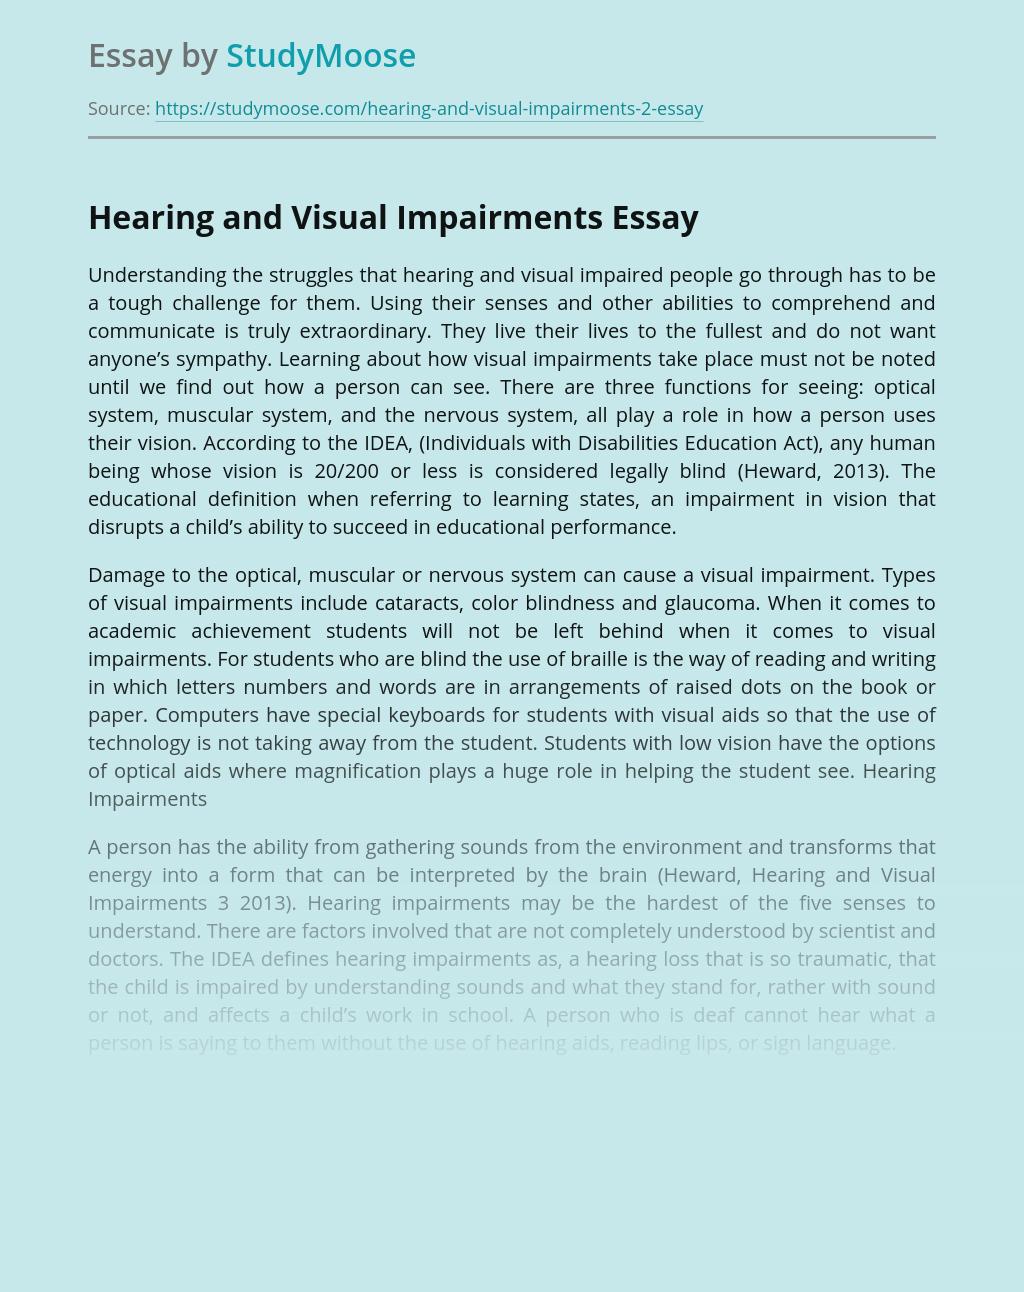 Hearing and Visual Impairments